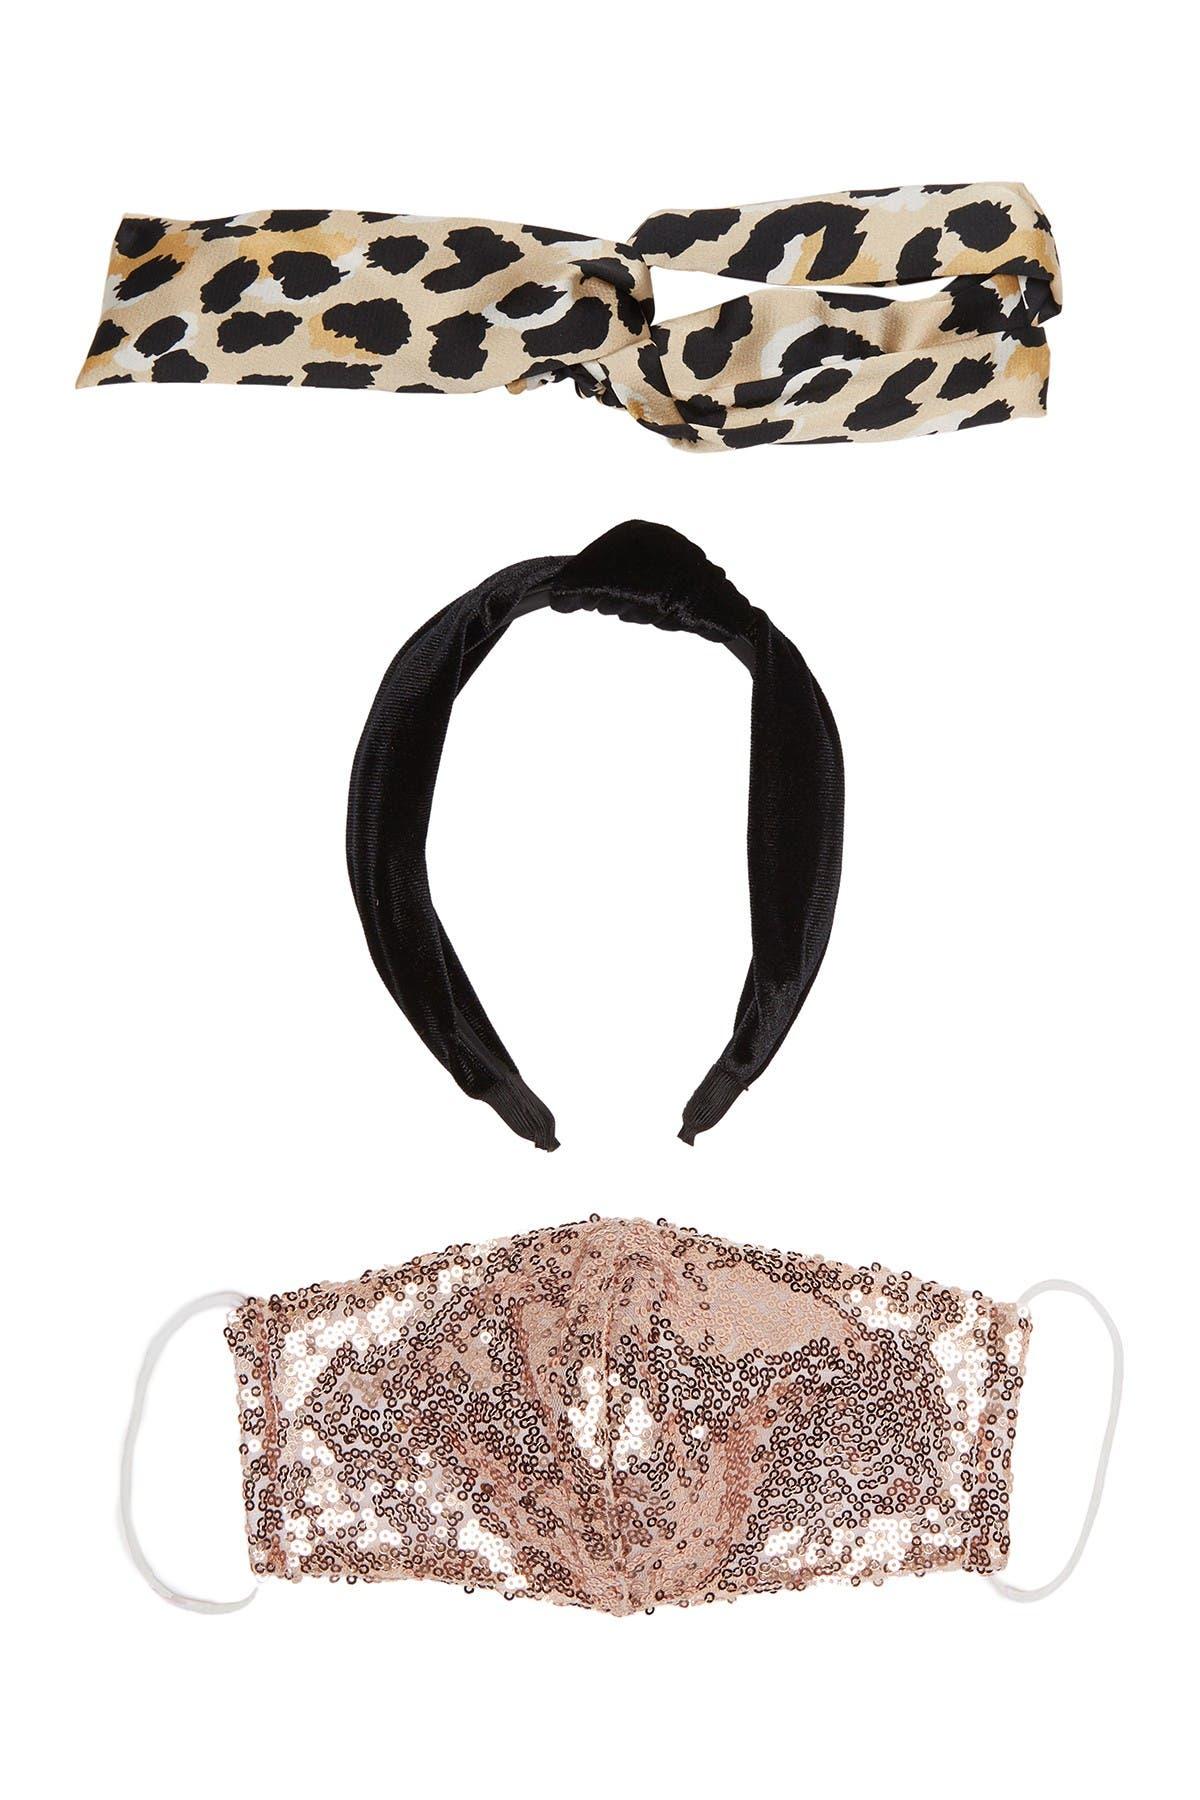 Image of Panacea Rose Sequined Face Mask & Headband 3-Piece Set